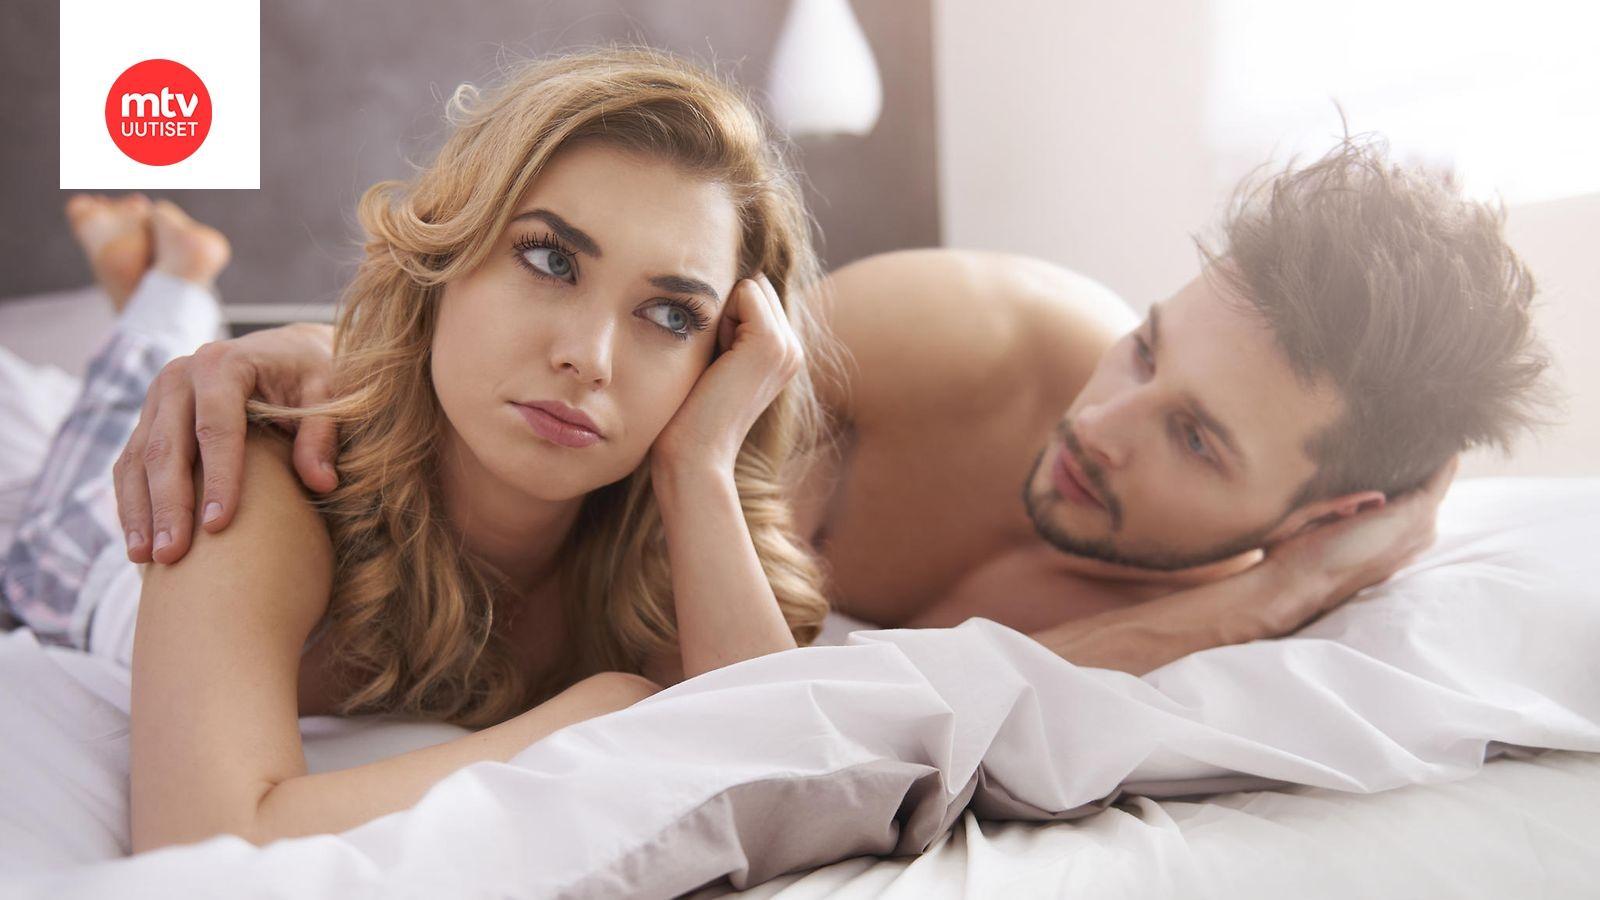 paras online dating verkko sivuilla Saksassa